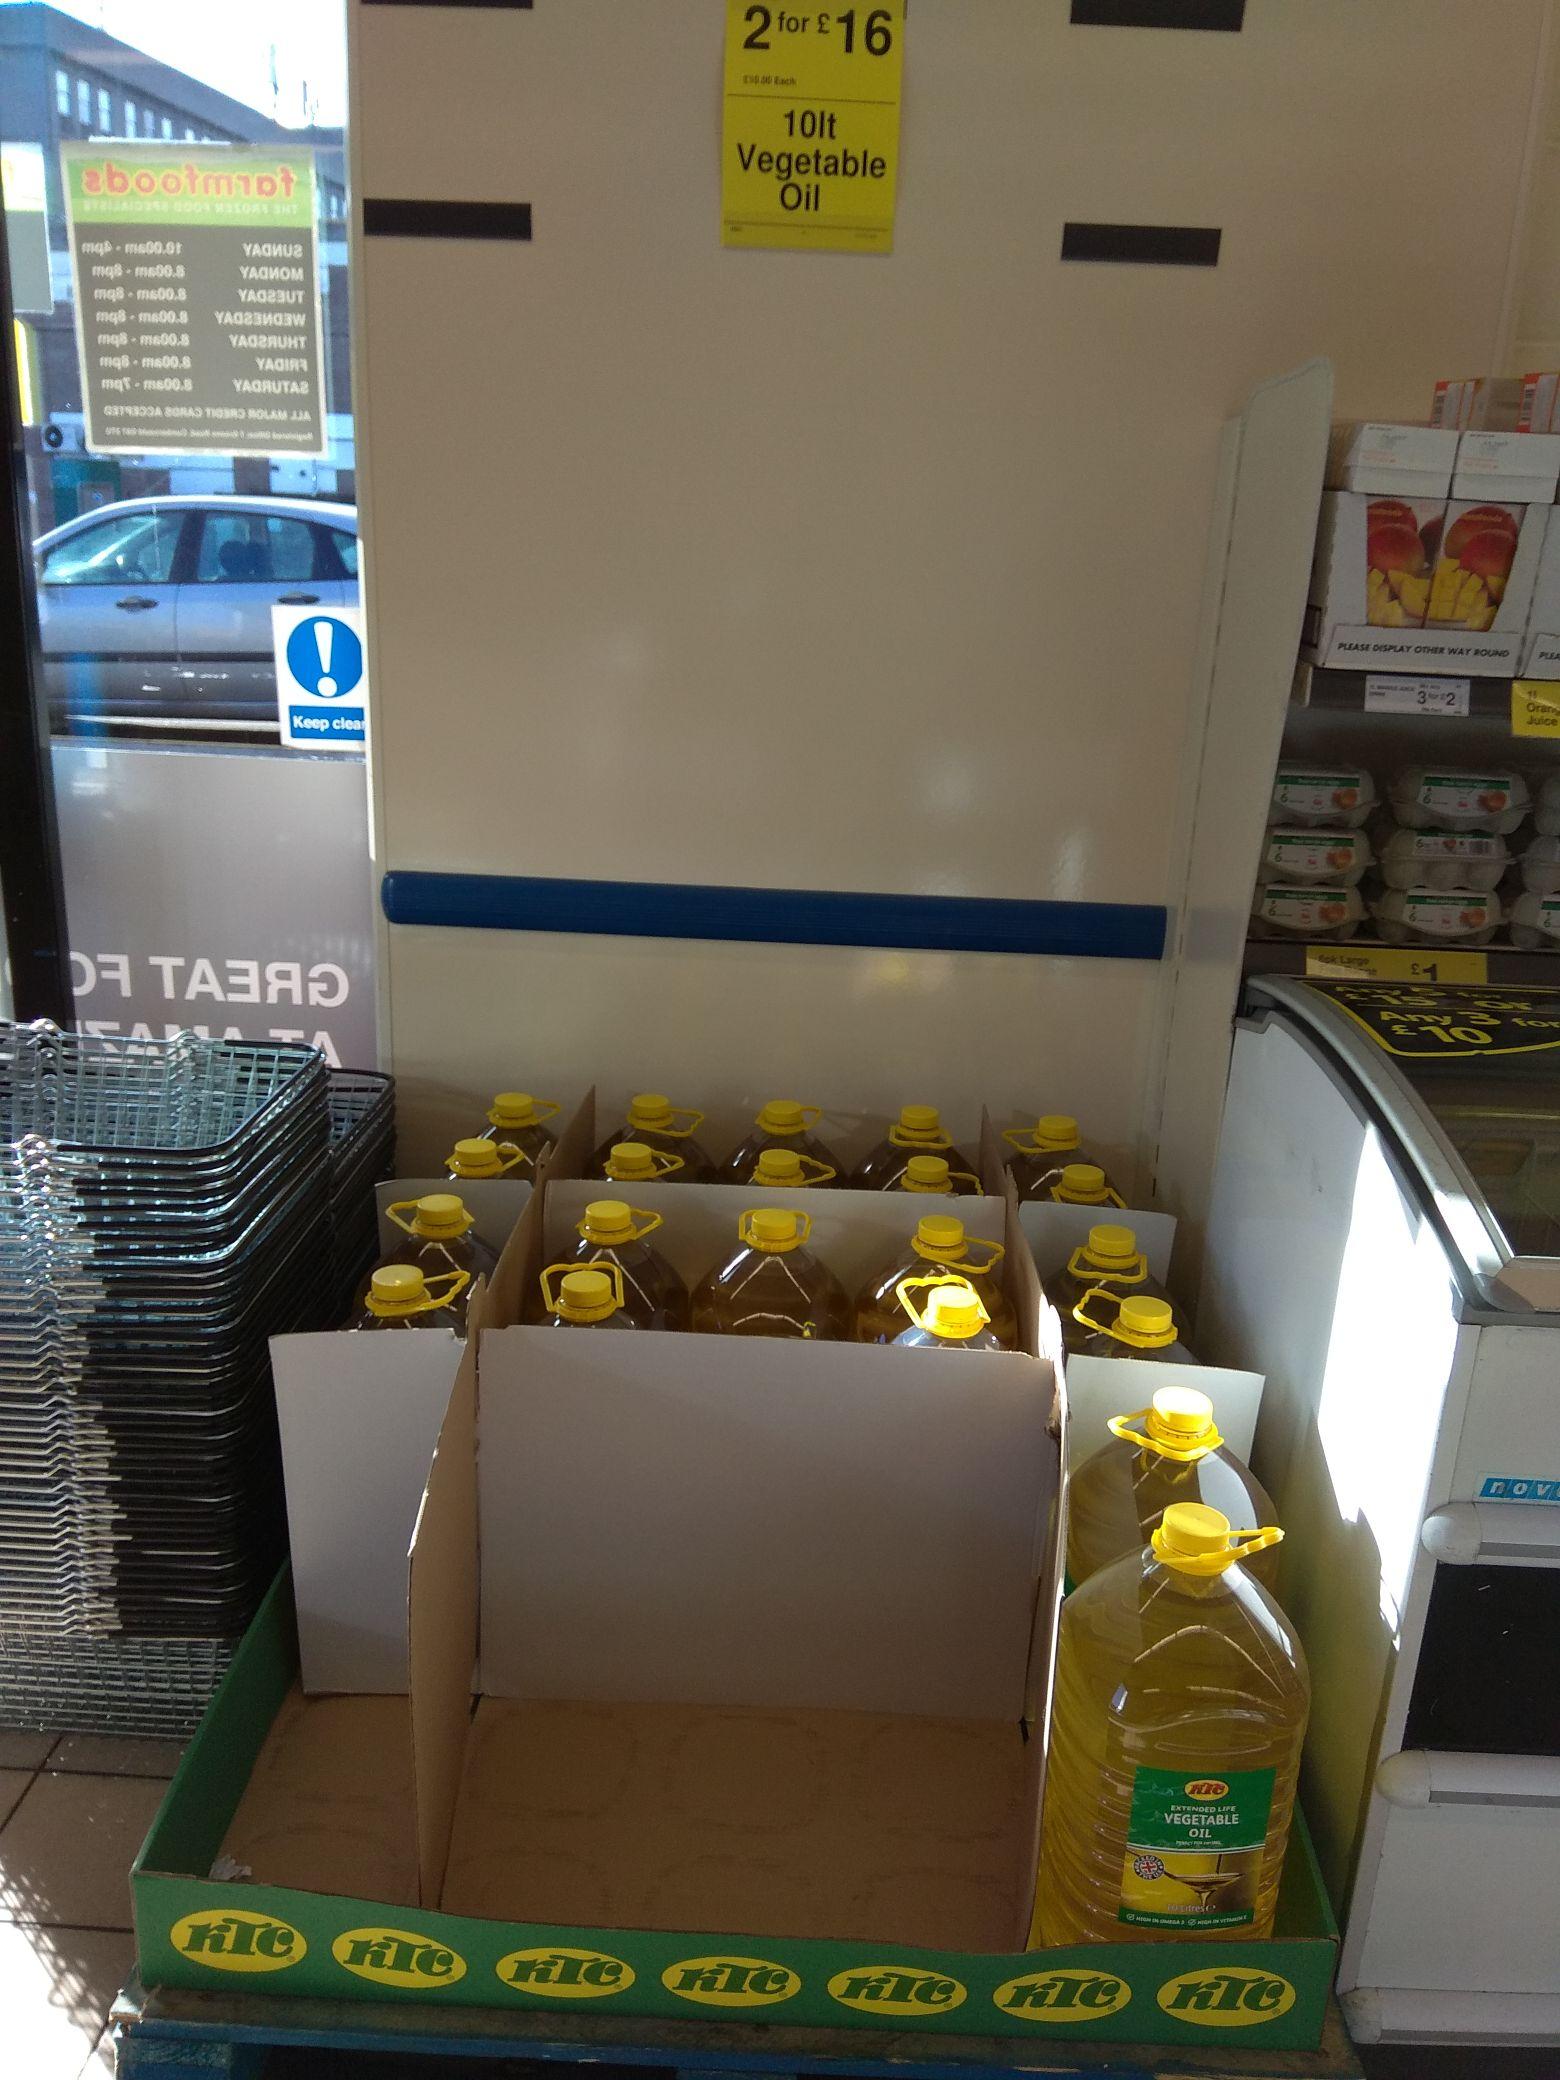 20 litres of KTC Vegetable Oil - £16 @ Farmfoods